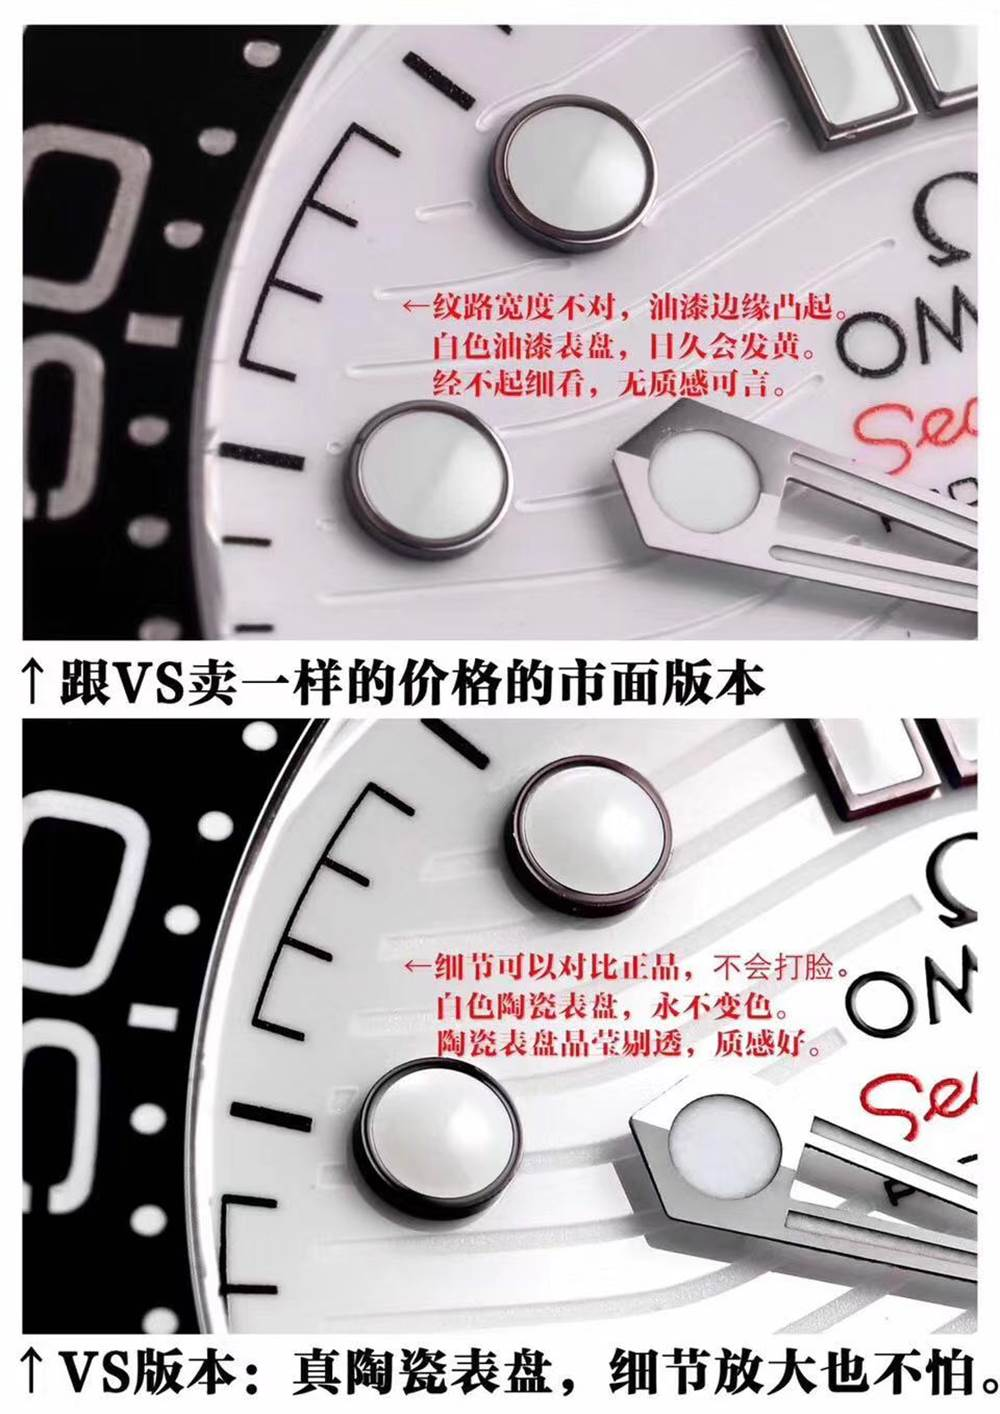 VS厂欧米茄海马300熊猫色对比市场版本怎么样